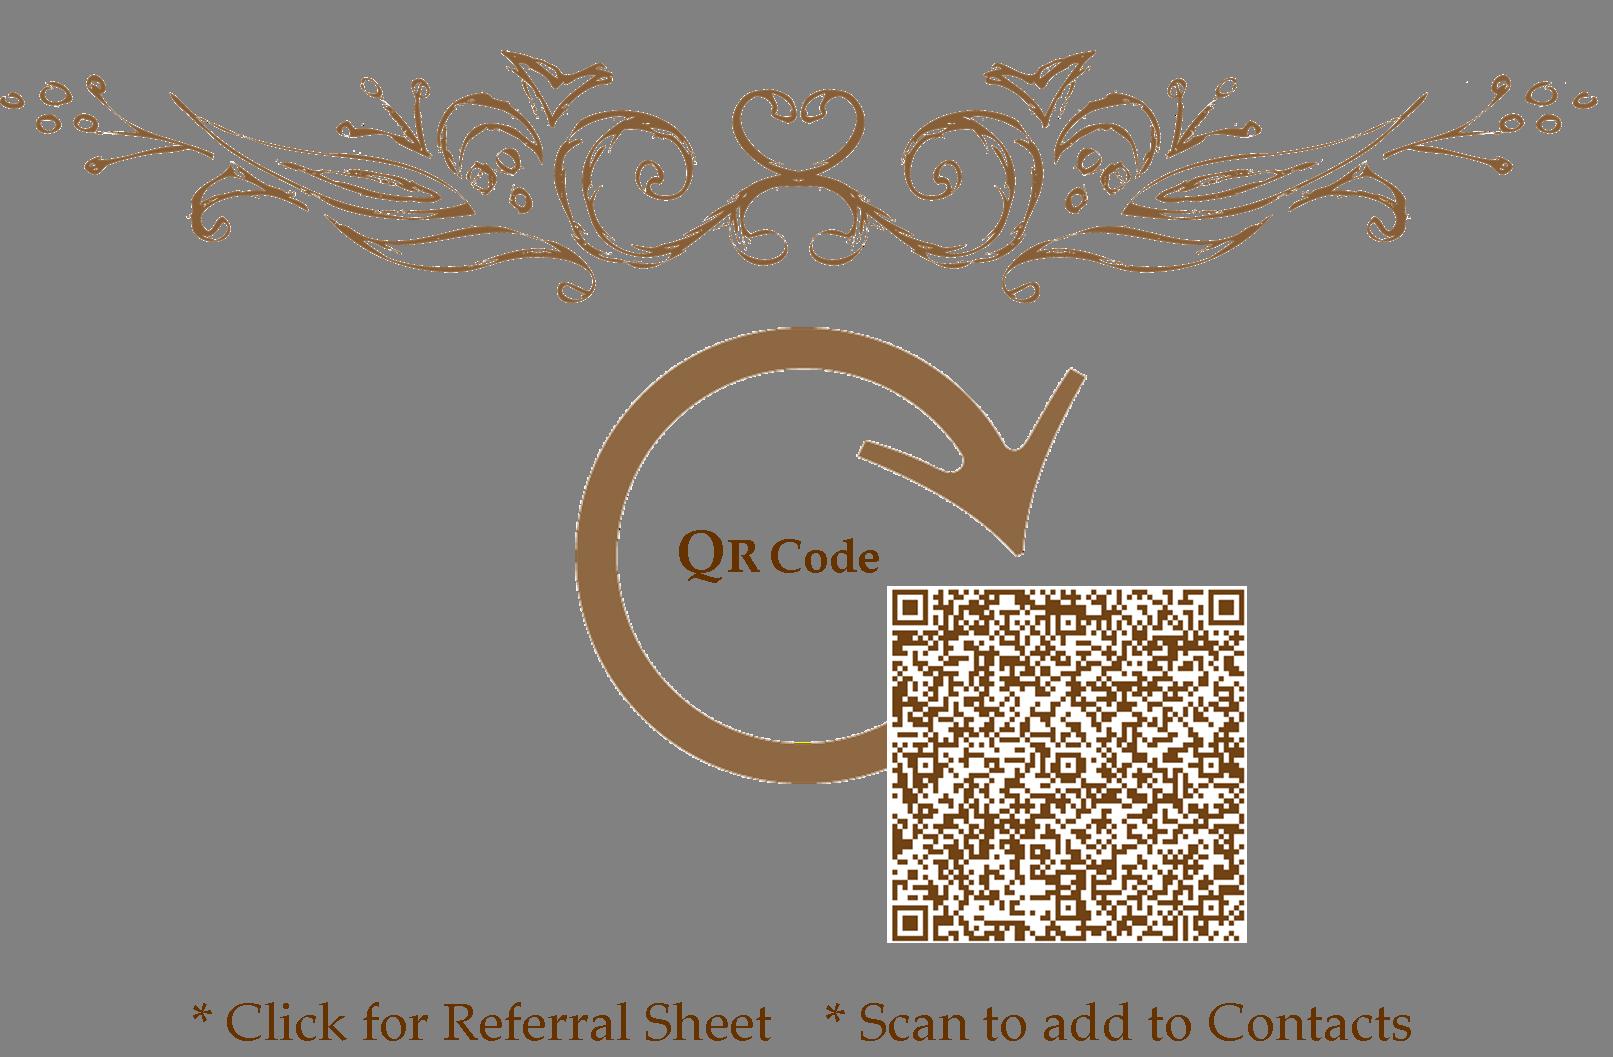 QR Code Vcard Scan Wyatt Rehabiliation Wyatt Rehabilitation Physical Therapy and Lymphedema, Venous Edema, Wound Care, Breast Cancer Rehabilitation Lymphedema Treatment